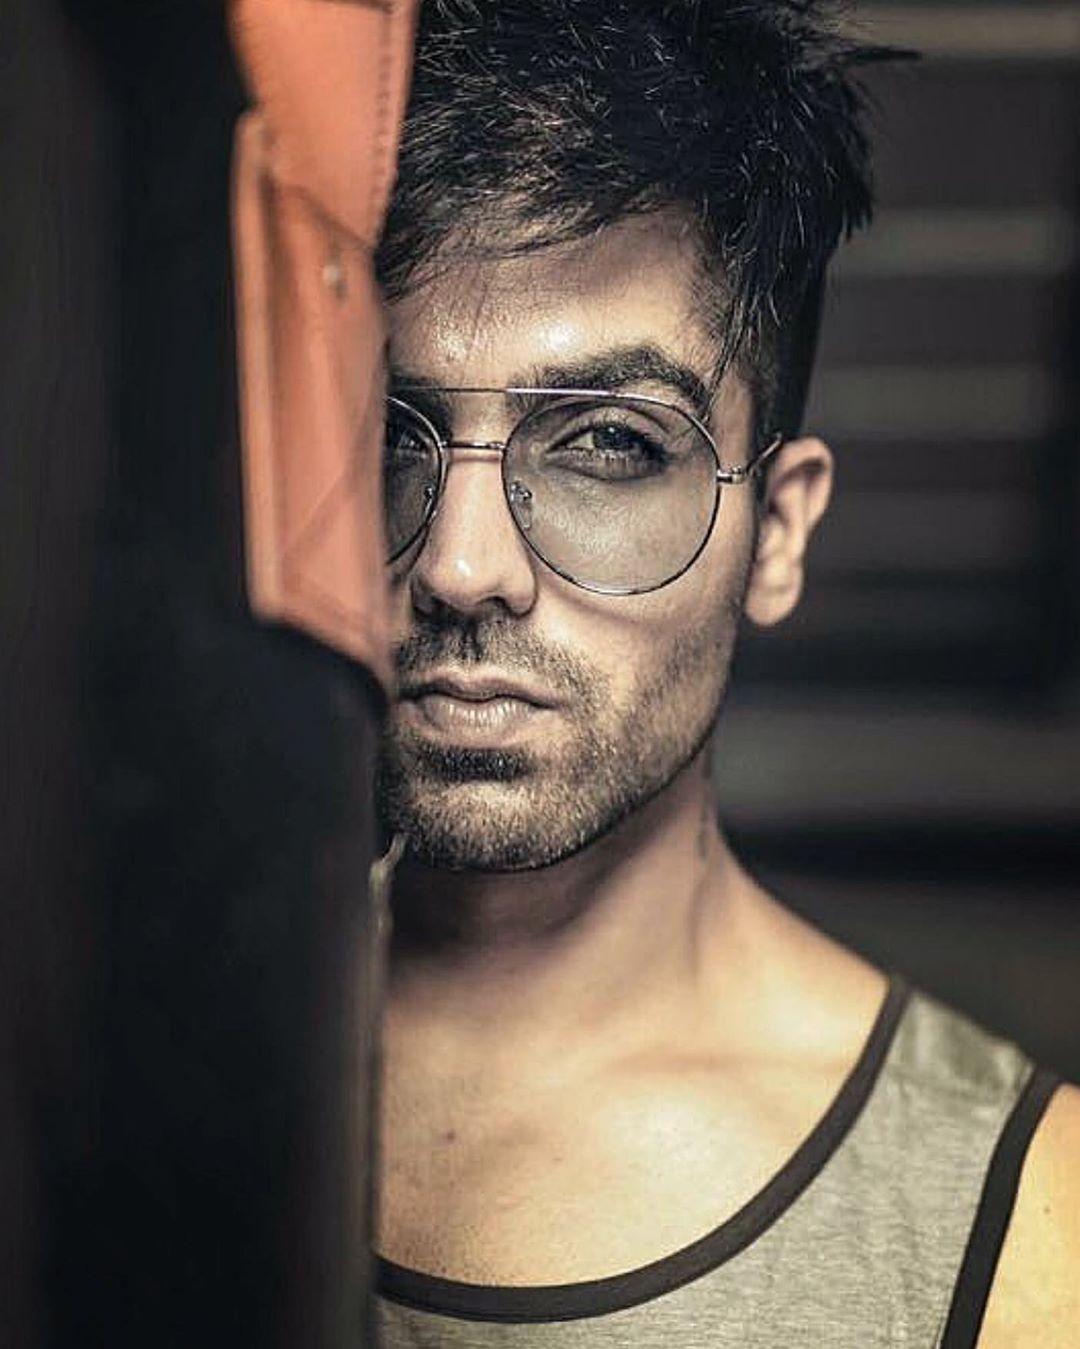 hardy Sandhu photos